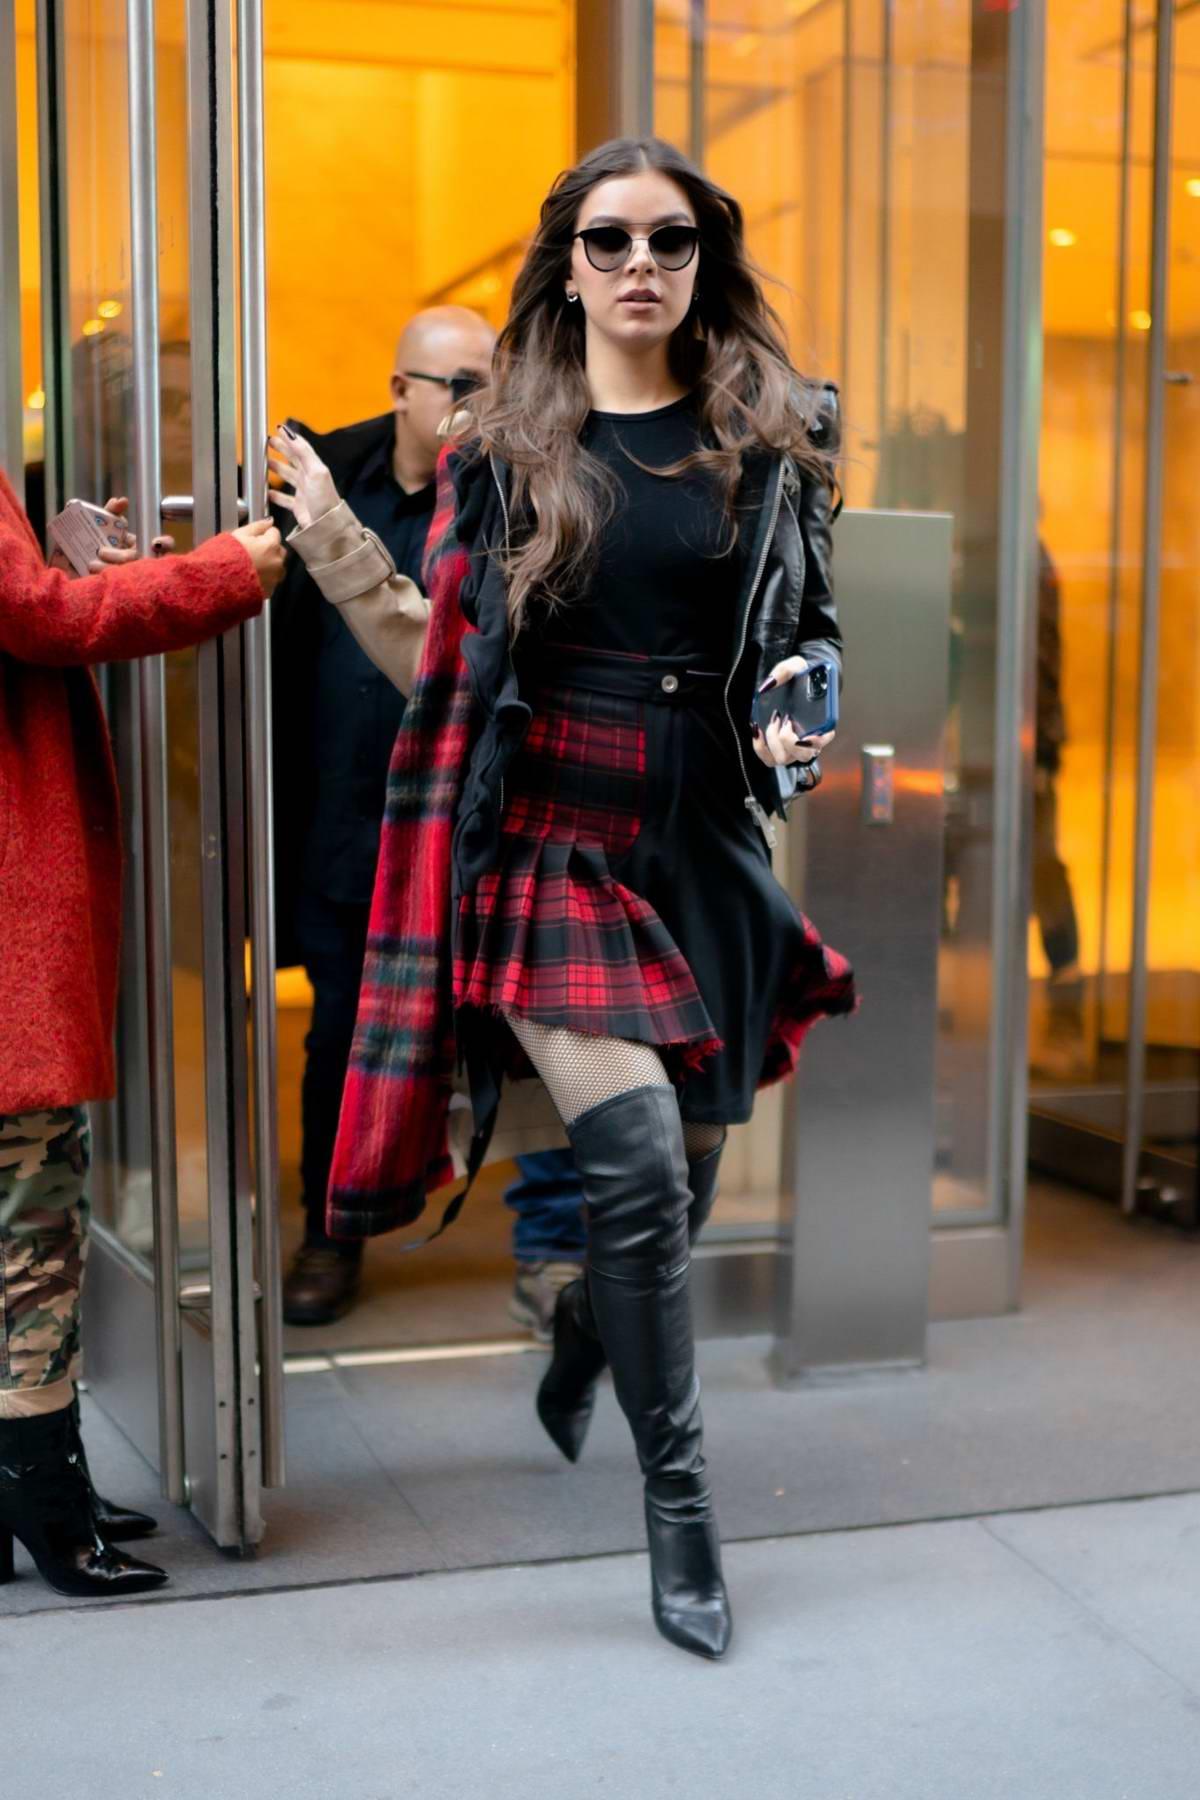 Hailee Steinfeld visits SiriusXM Studios to promote Apple TV+'s 'Dickinson' in New York City